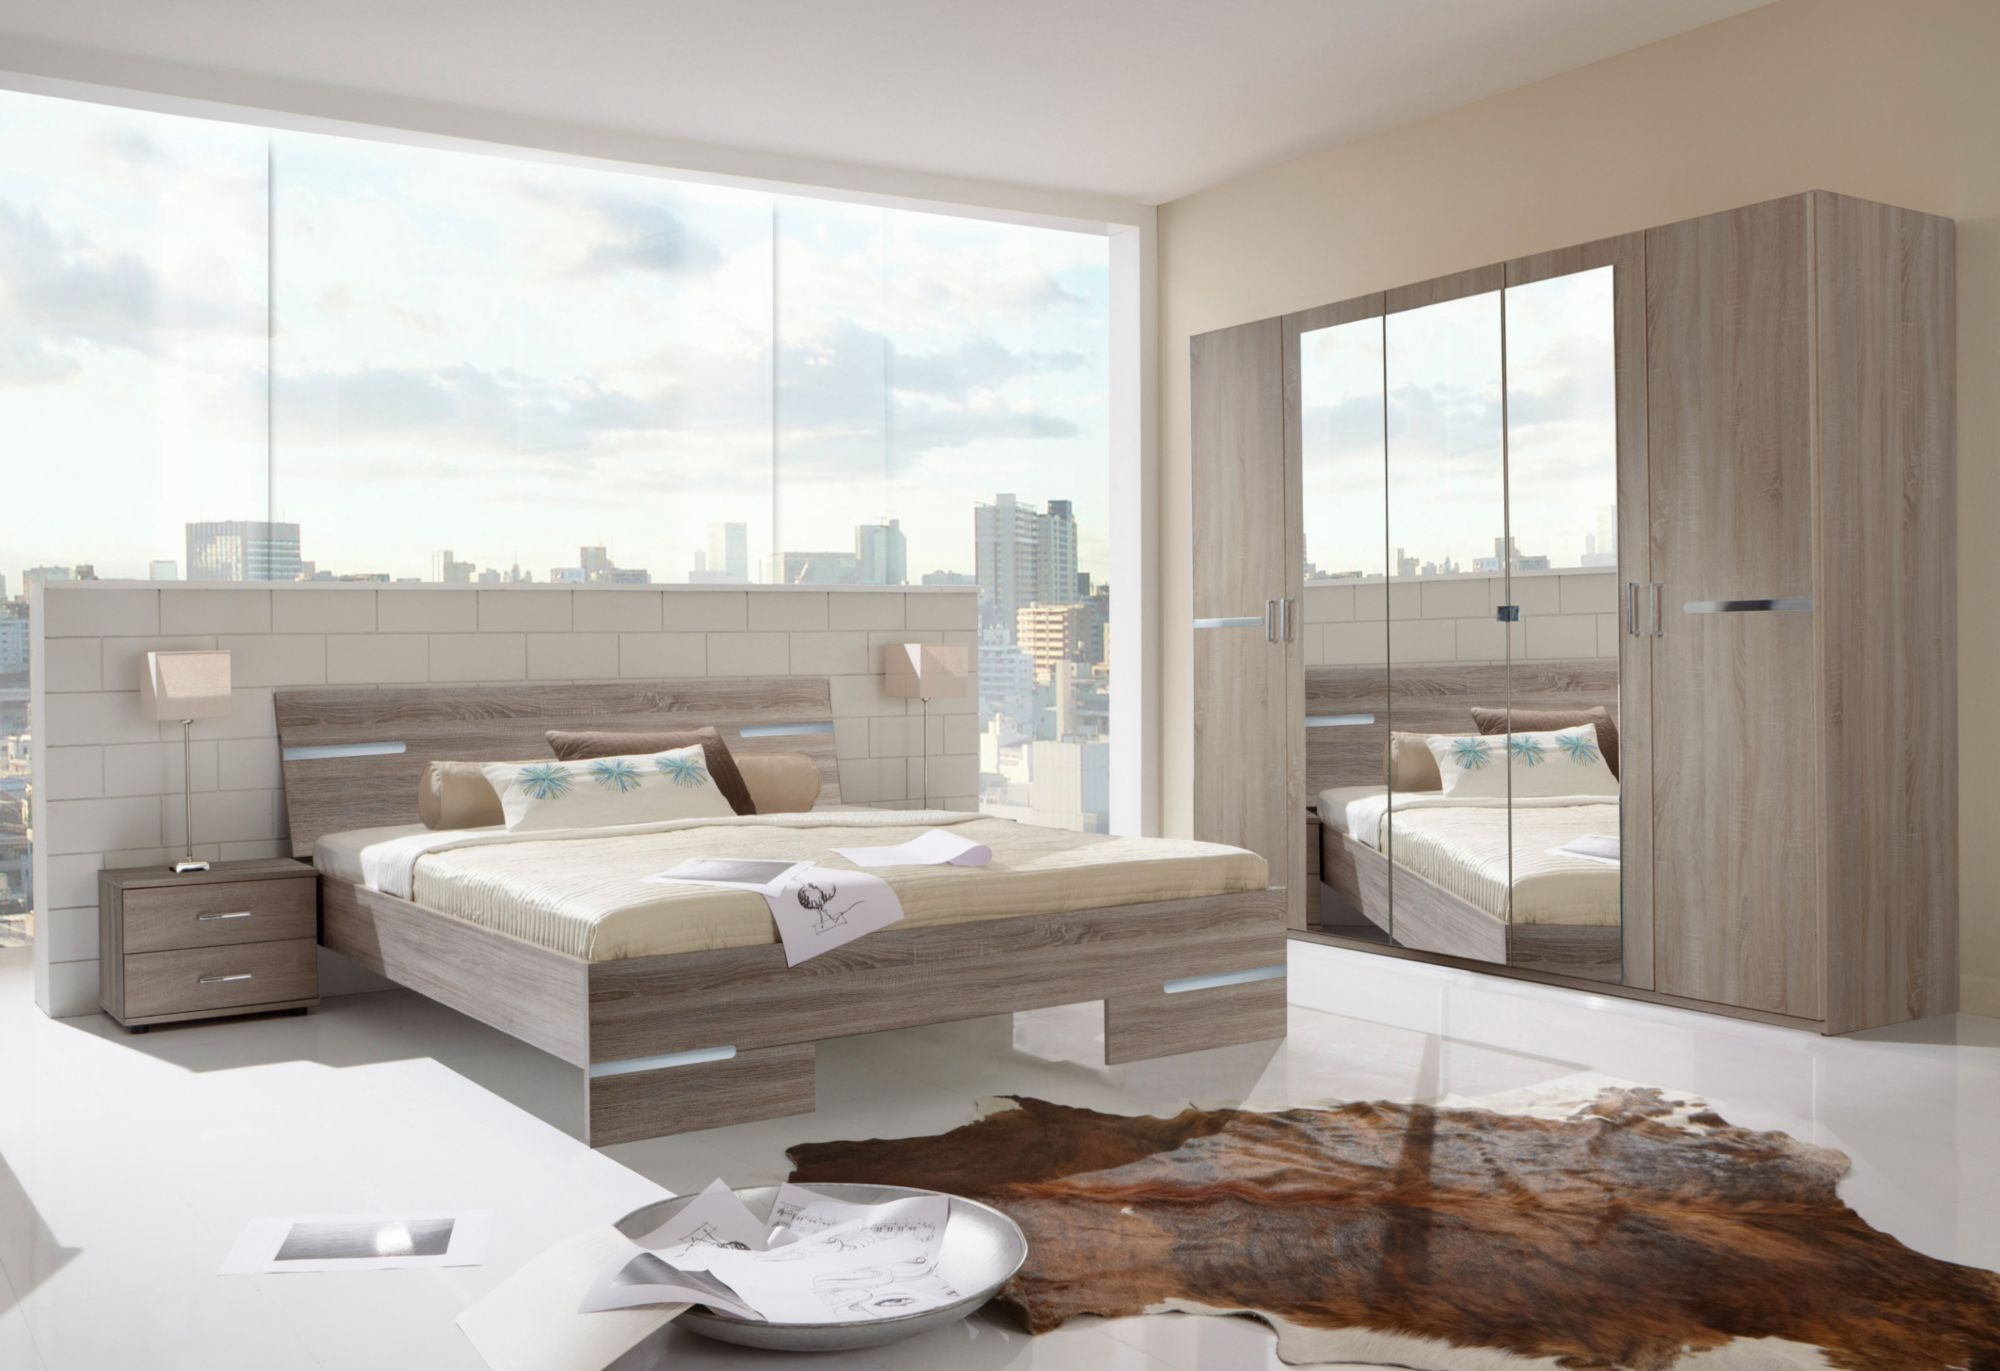 komplettschlafzimmer im schwab online shop m bel betten. Black Bedroom Furniture Sets. Home Design Ideas